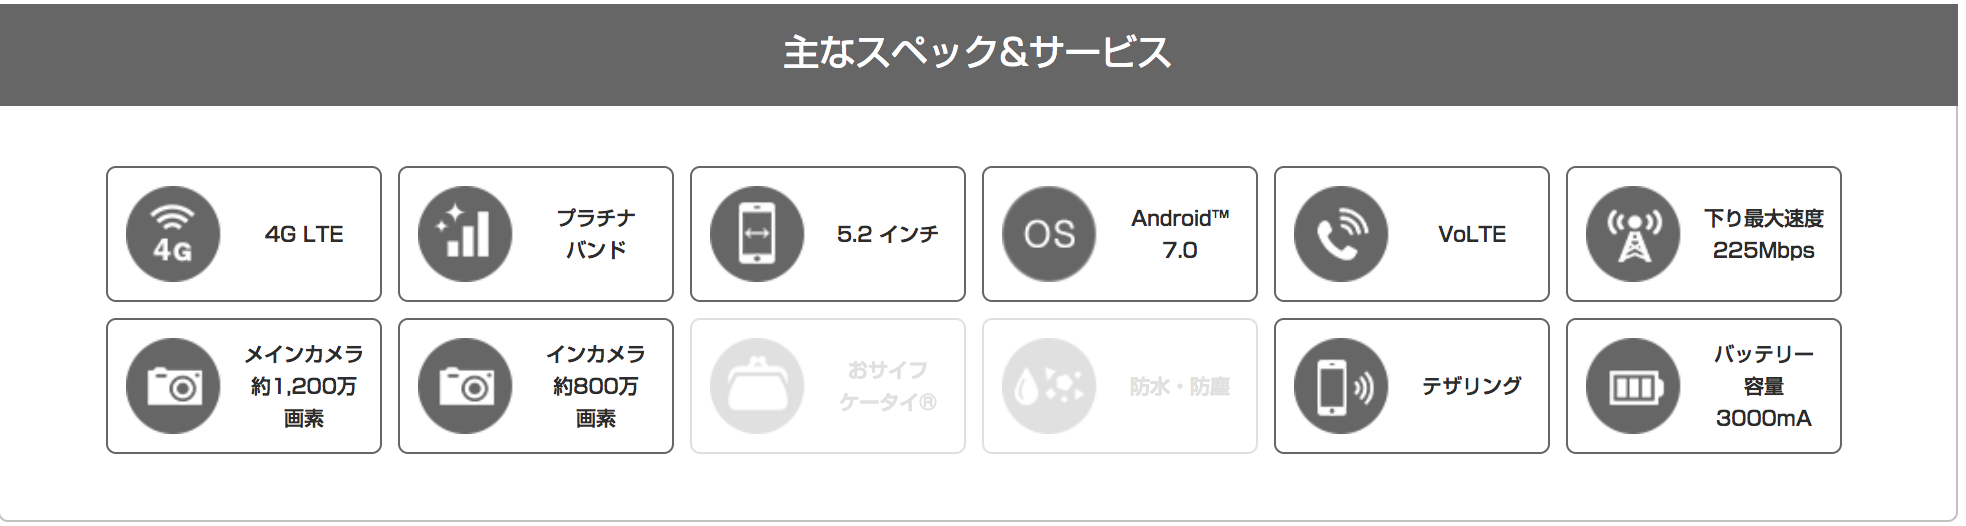 UQモバイル口座振替で買う「HUAWEI P10 lite」の特徴